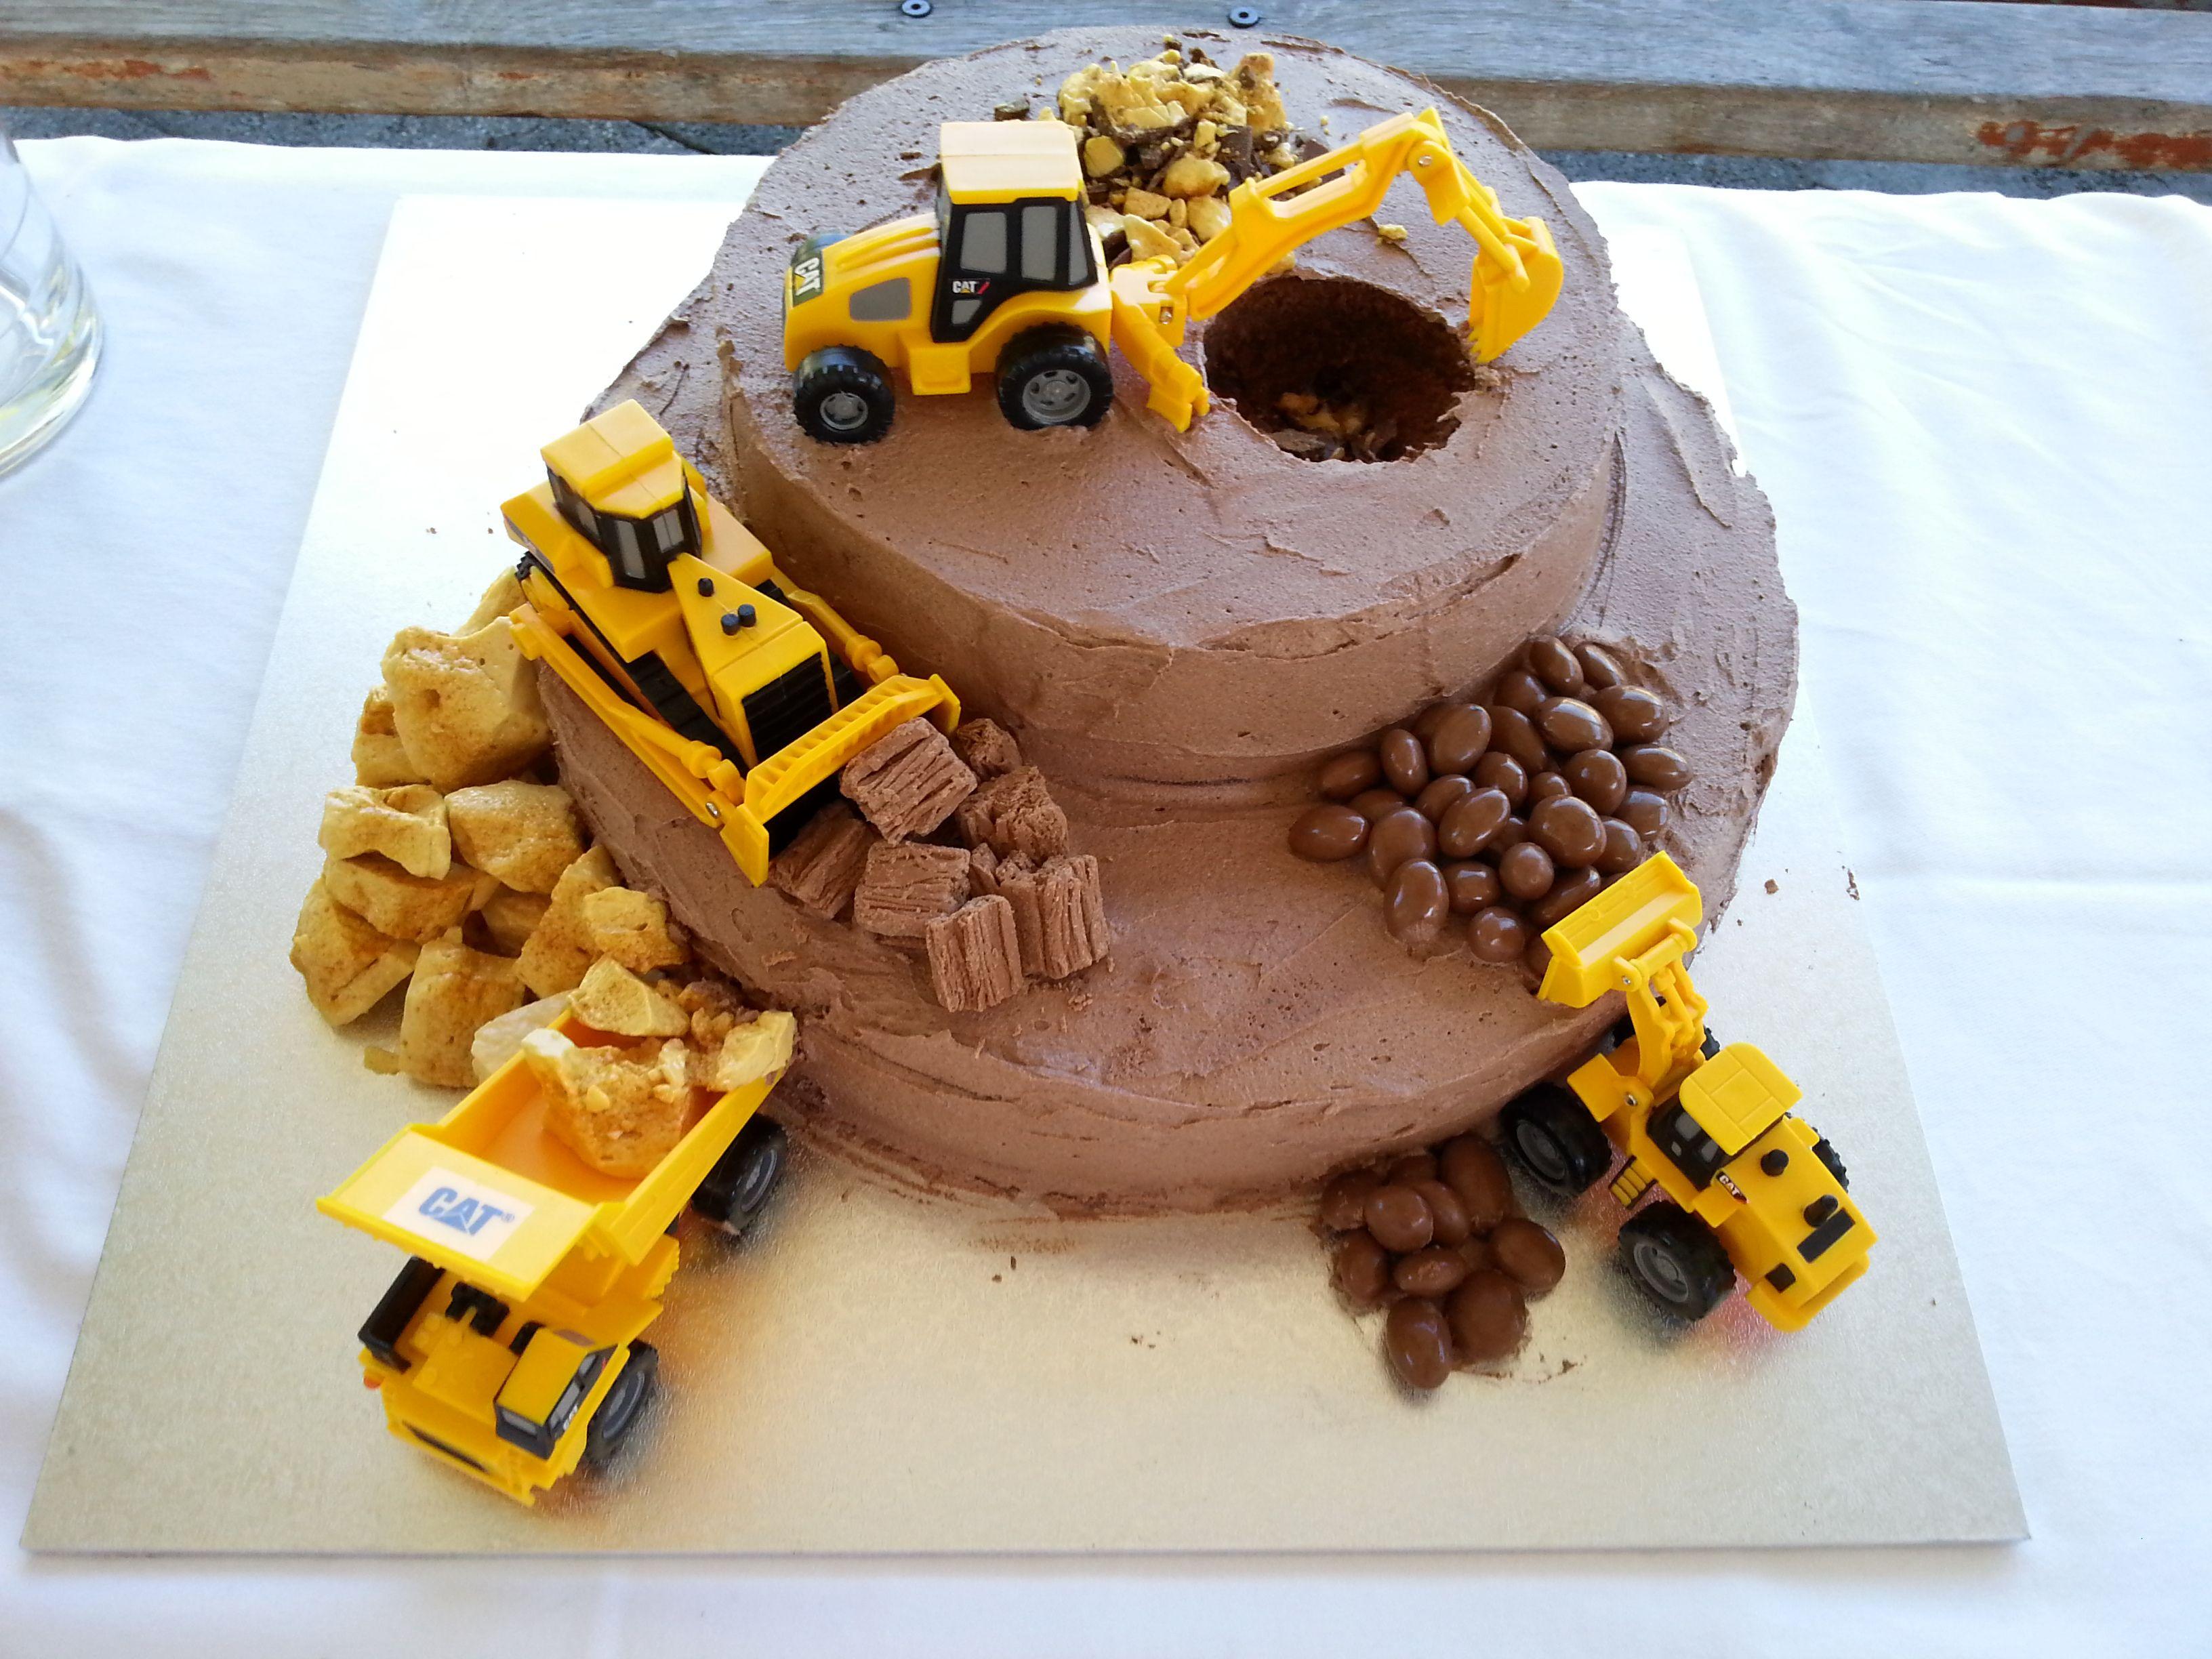 Sensational Construction Site Cake With Images Construction Cake Birthday Funny Birthday Cards Online Necthendildamsfinfo